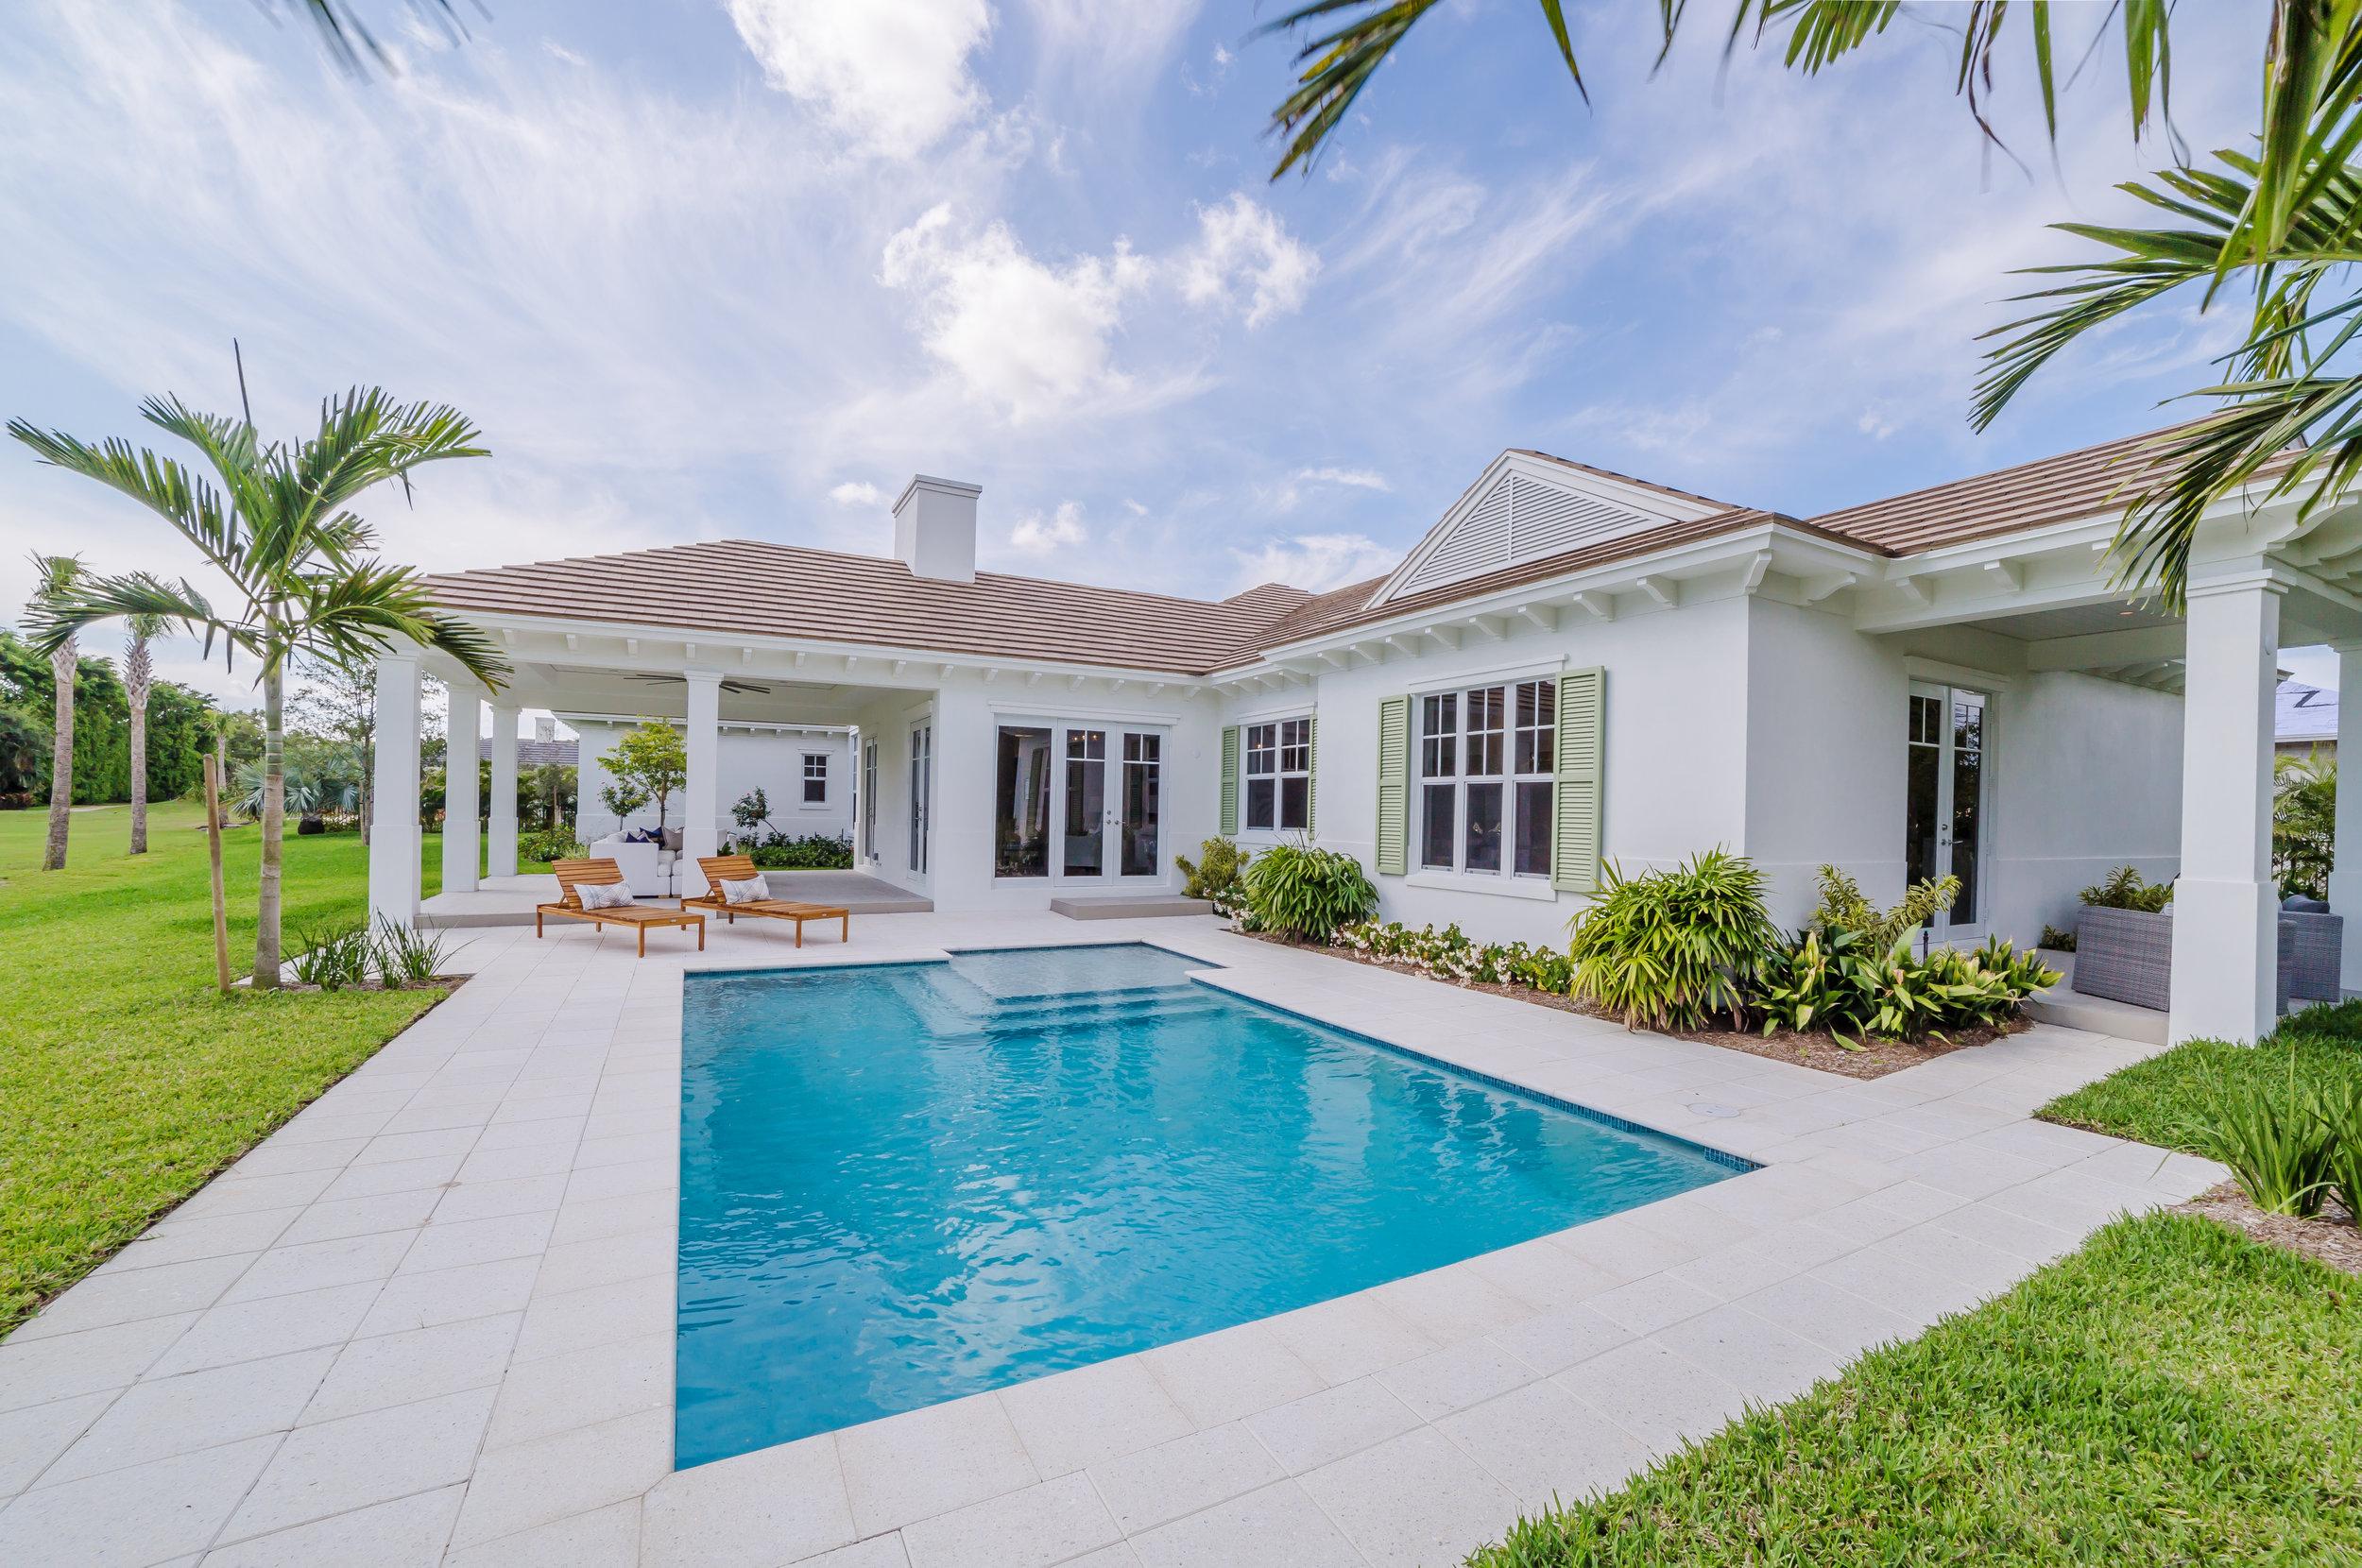 Custom Home   Delray Beach, FL  Architect: Richard Jones  Designer: Leighton Design Group   View Project